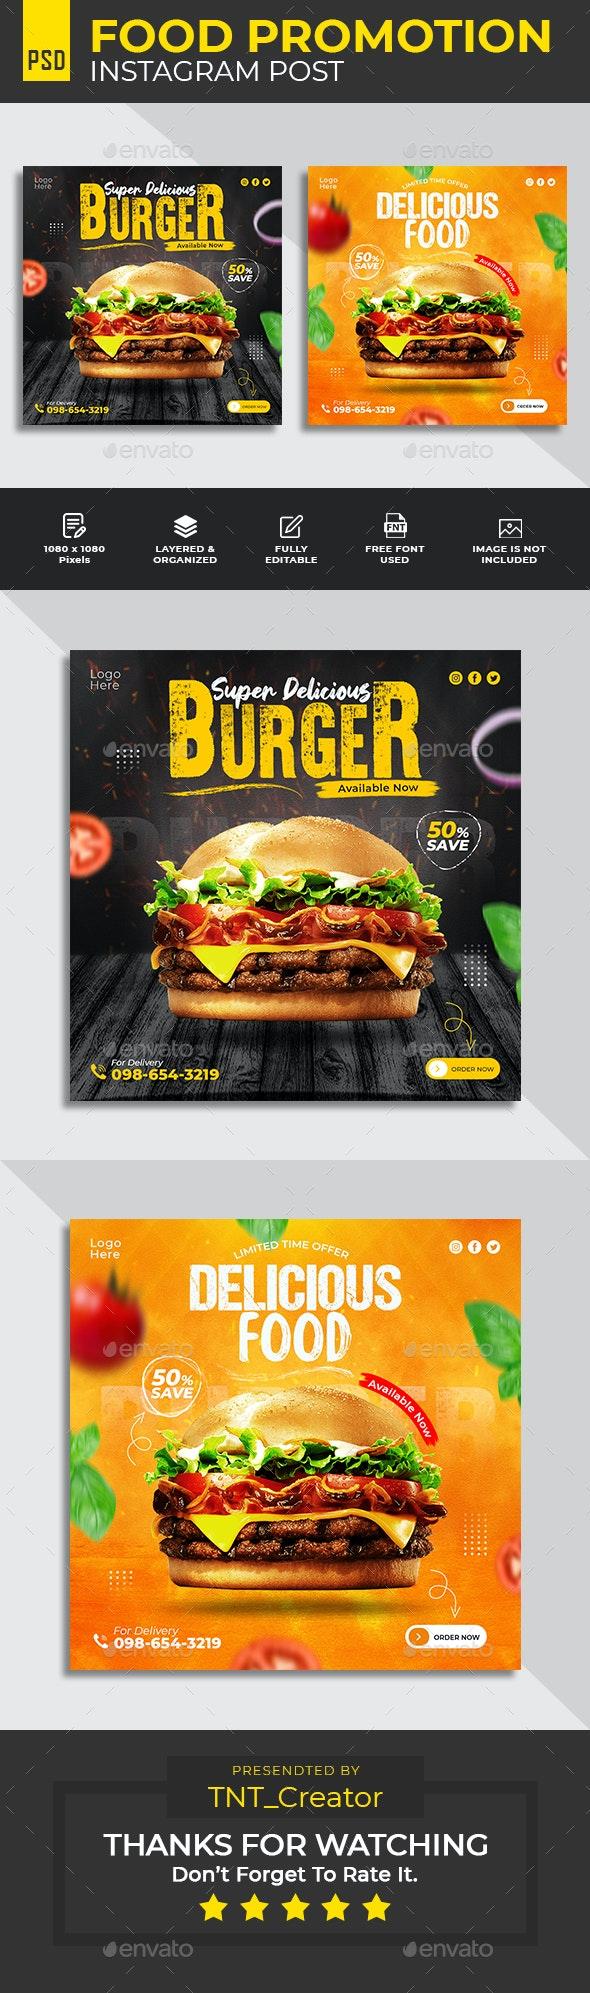 Special Food Social Media Post Banner Template - Social Media Web Elements